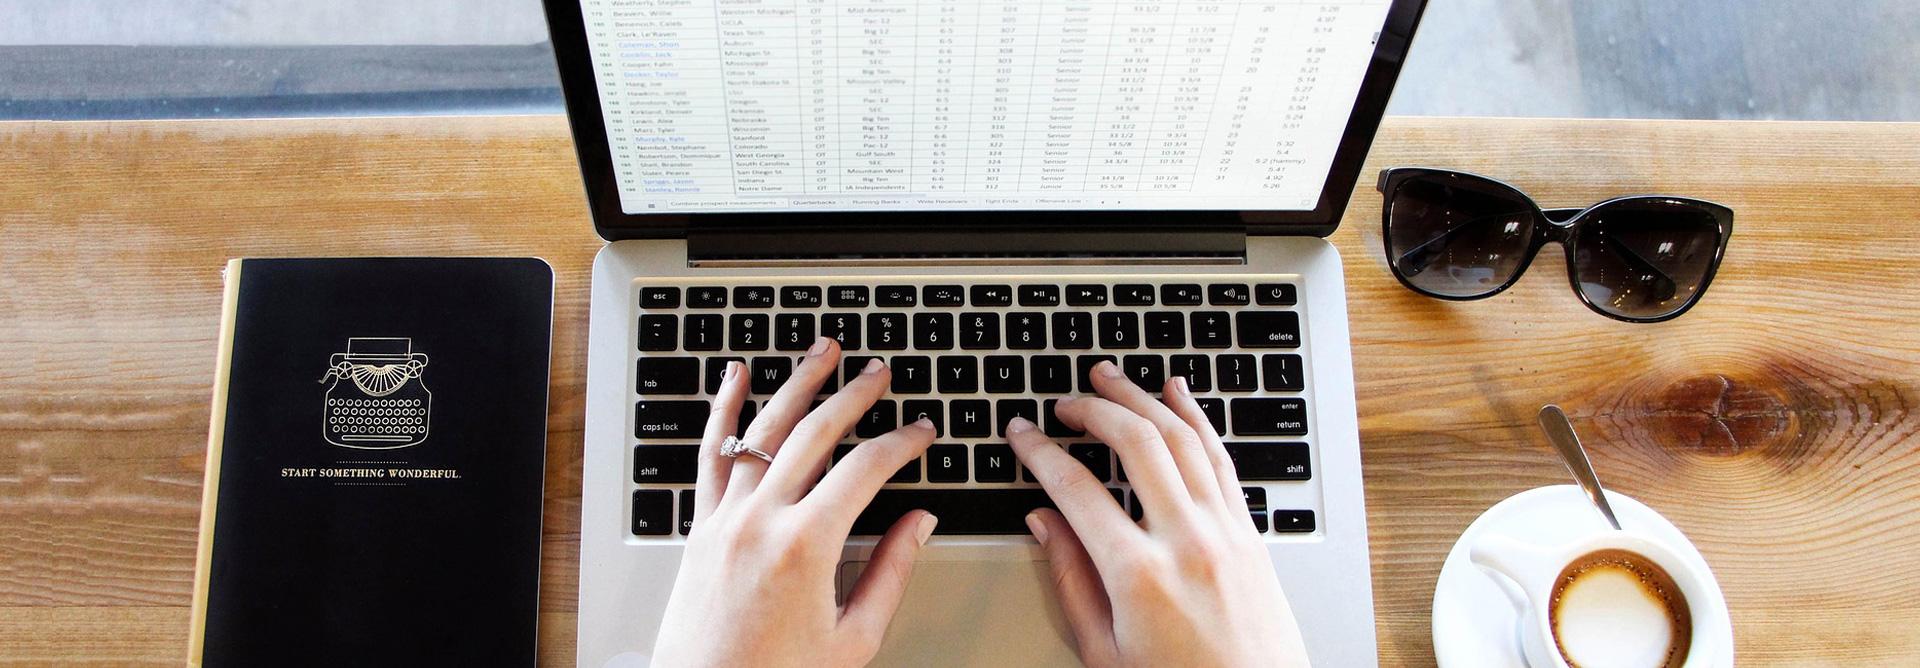 Leistungen Marktforschung